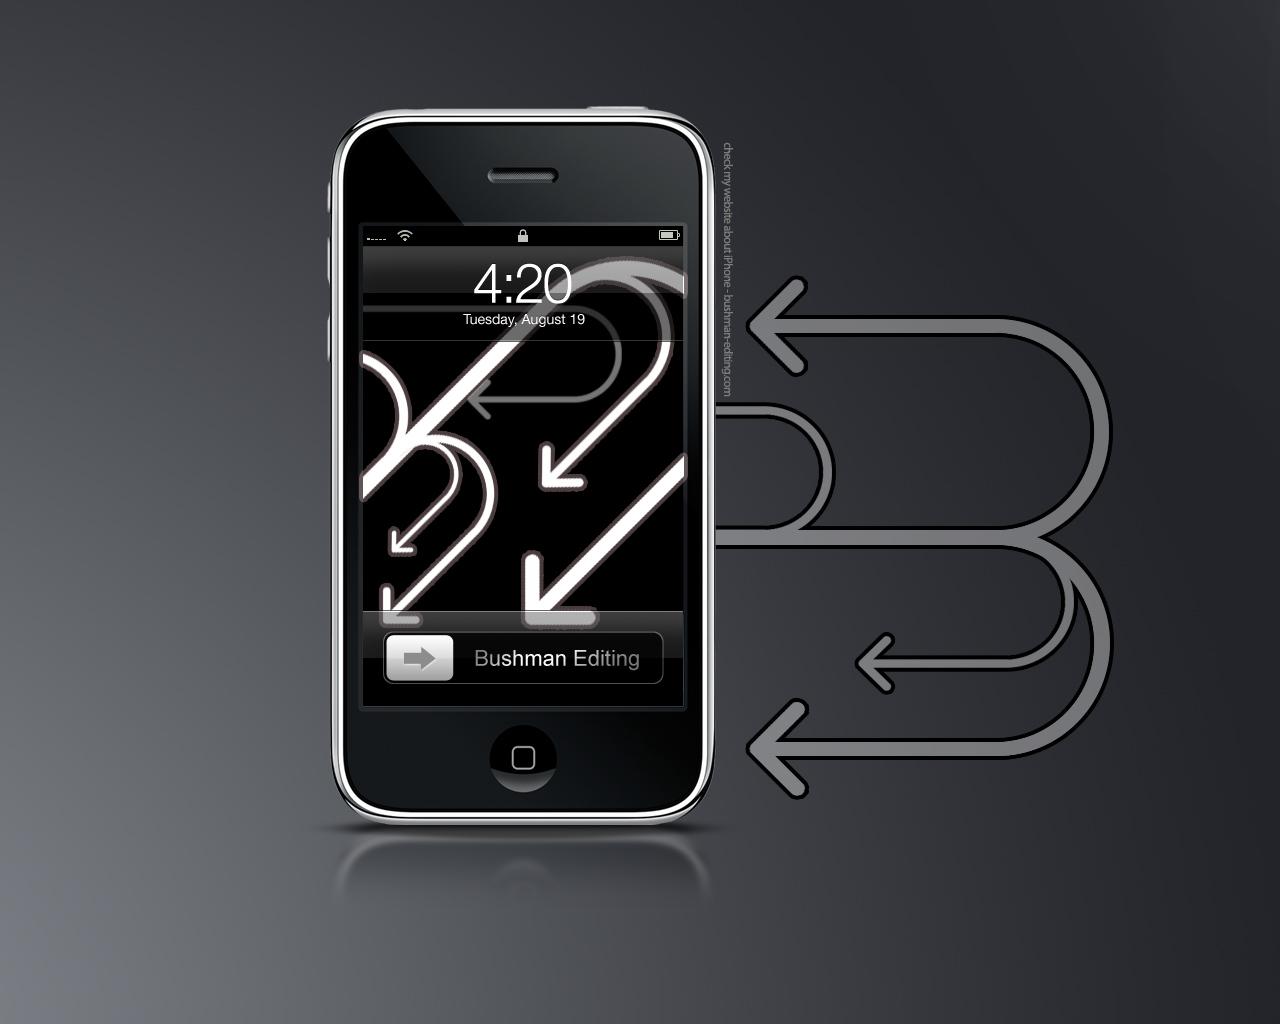 iPhone   lock screen by mr iphone 1280x1024